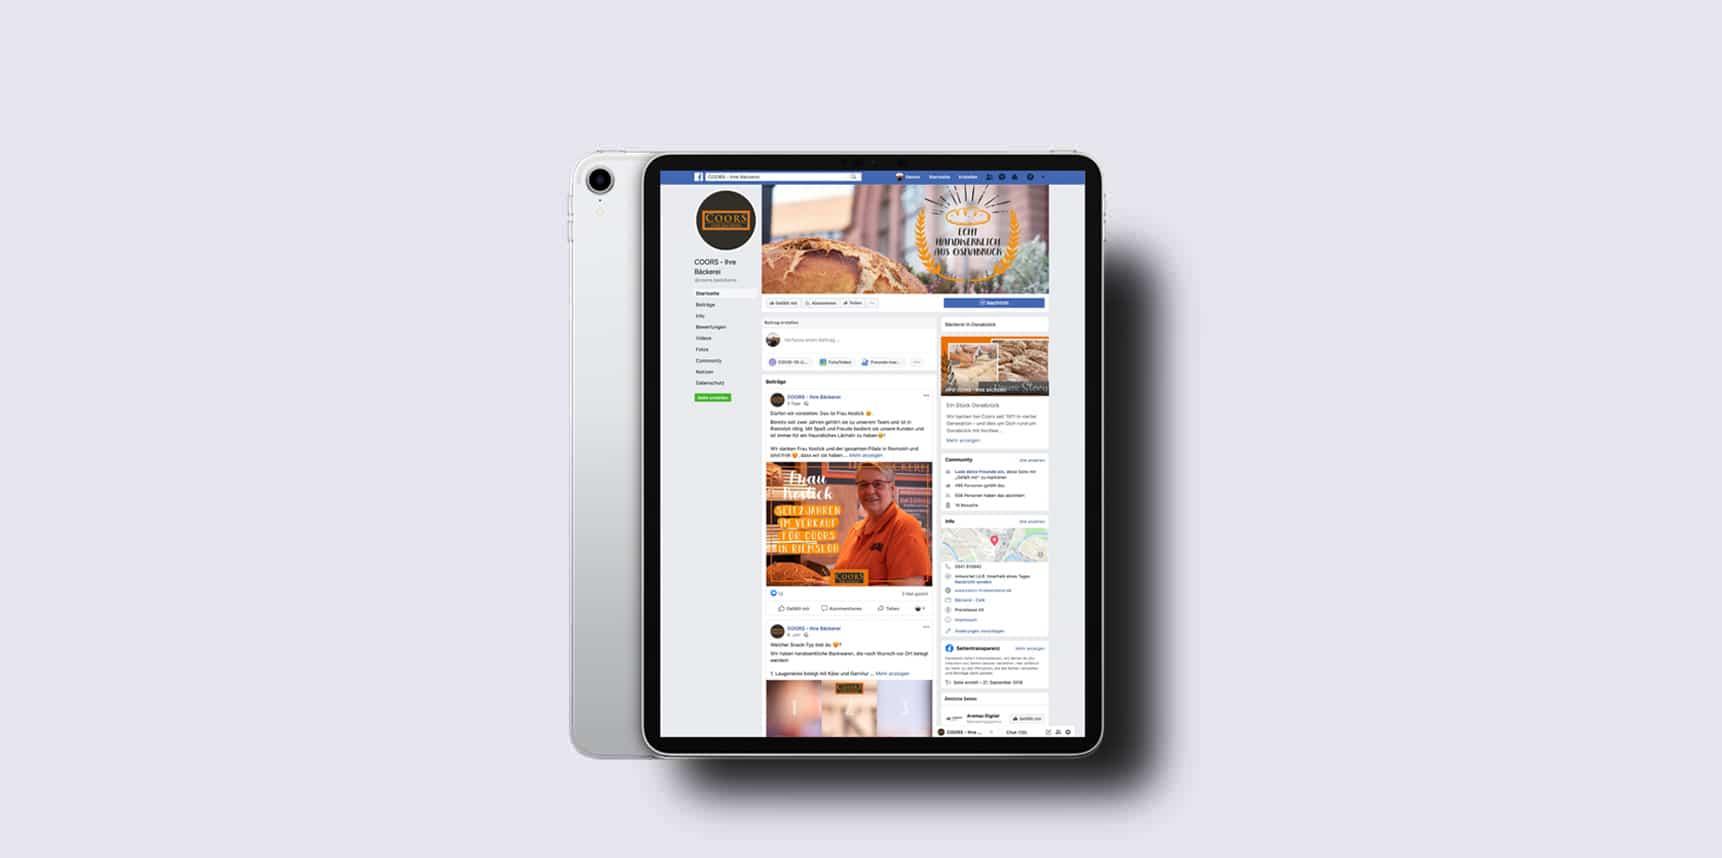 iPad Pro Mockup mit Facebookseite der Bäckerei Coors aus Osnabrück